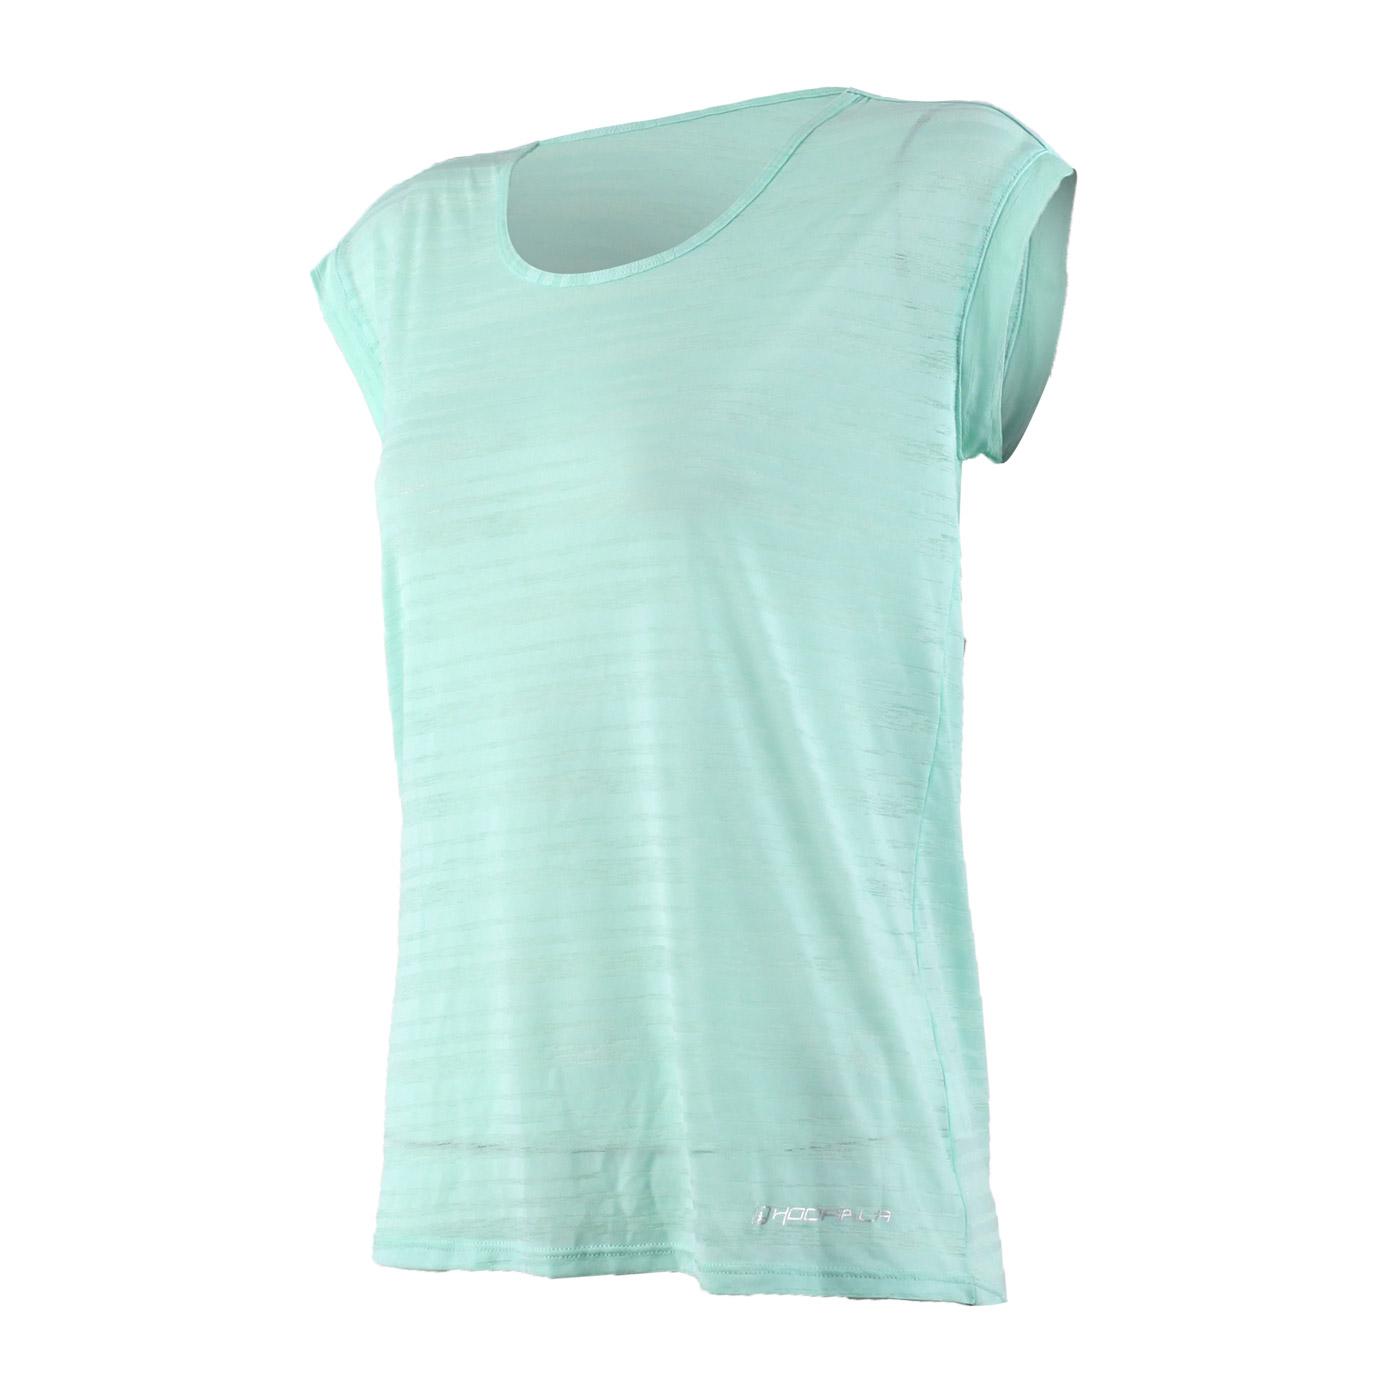 HODARLA 女款輕羽透膚短袖T恤 3126701 - 粉綠